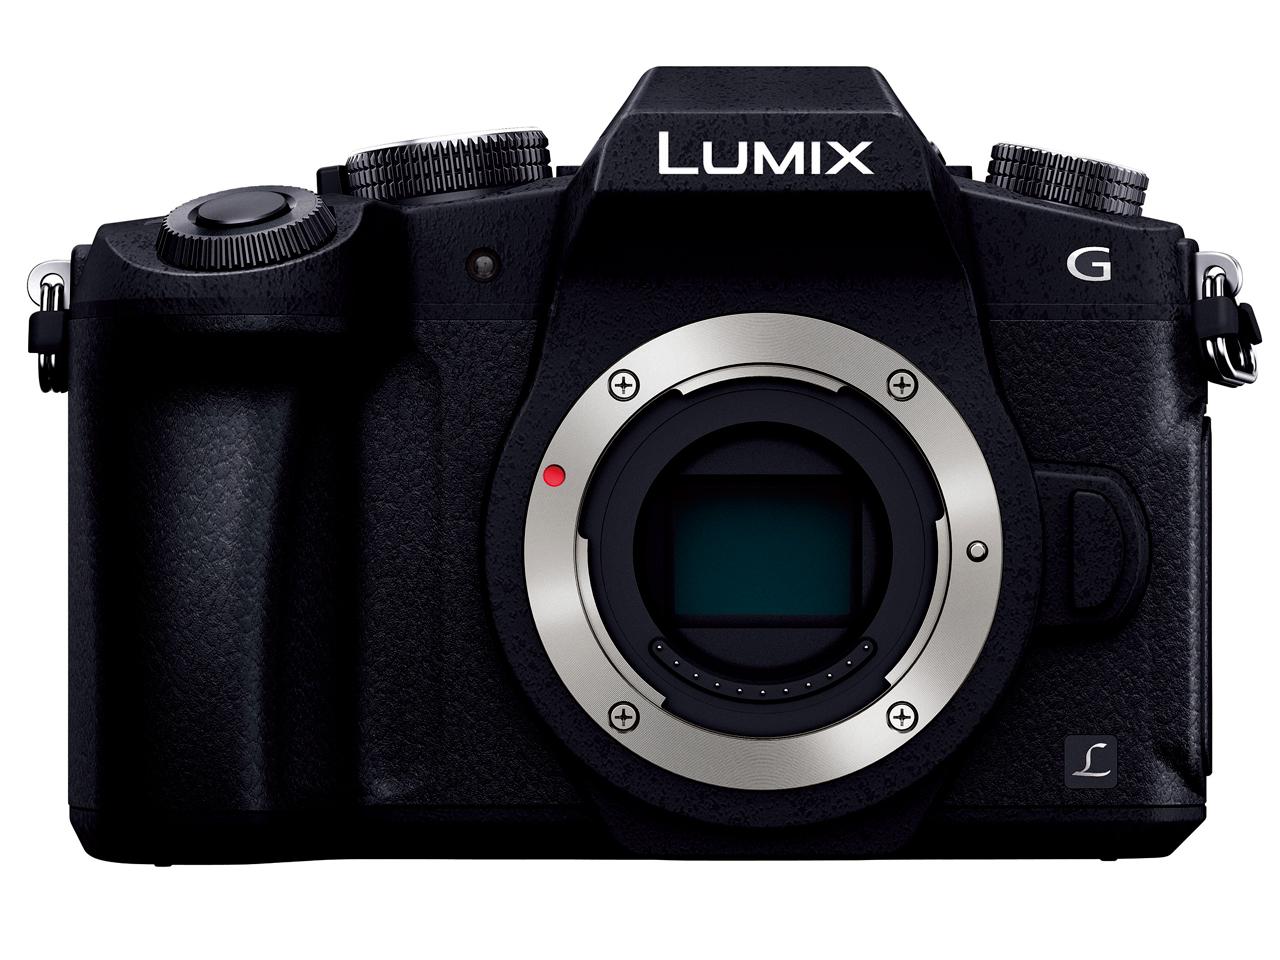 LUMIX DMC-G8 ボディ の製品画像